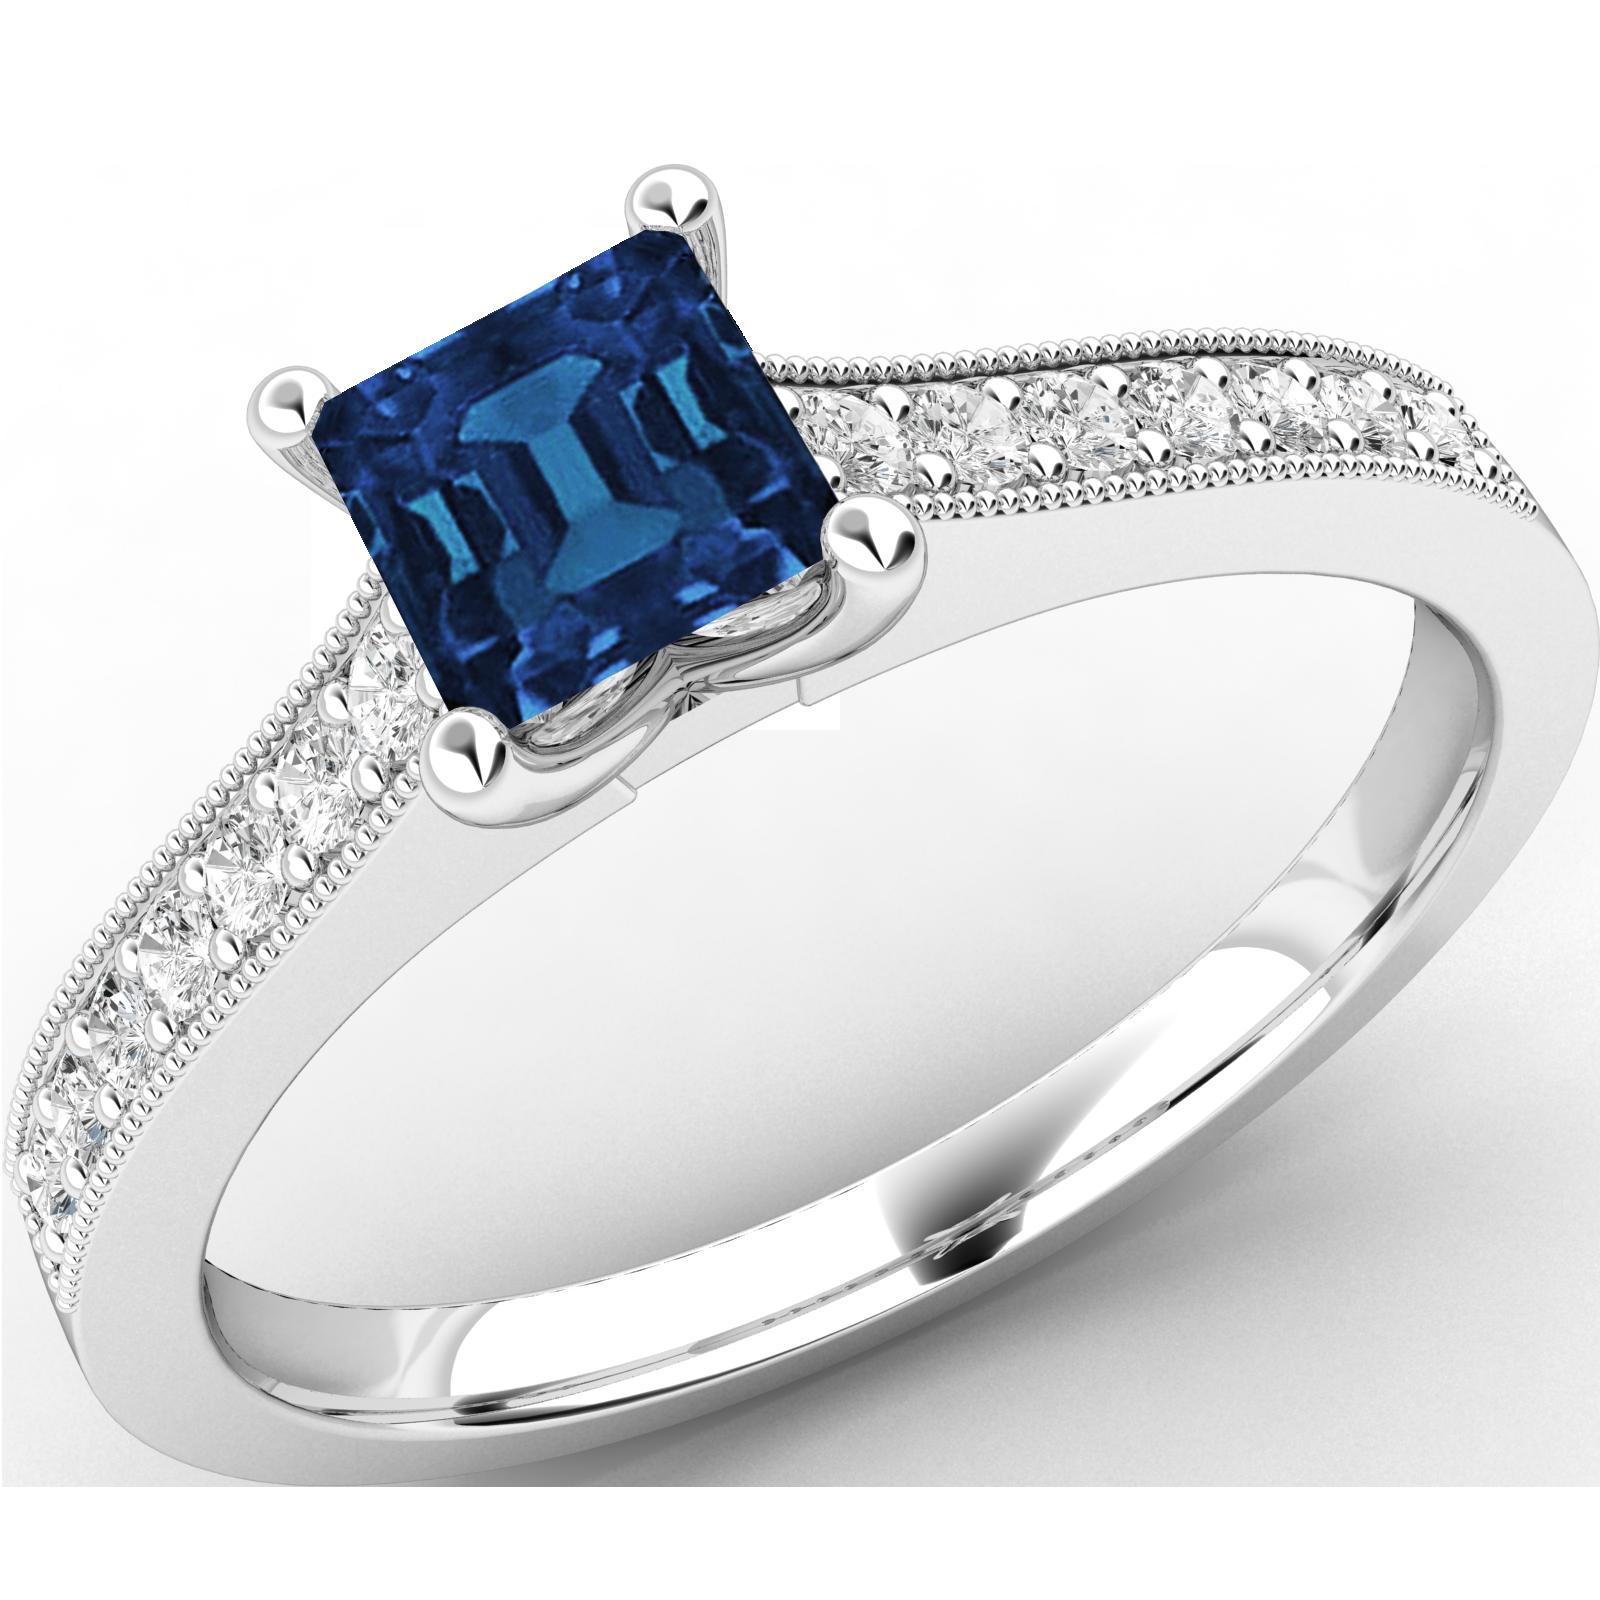 RDS495W-Inel cu Safir si Diamant Dama Aur Alb 18kt cu un Safir Patrat Central si Diamante Rotunde Briliant-img1